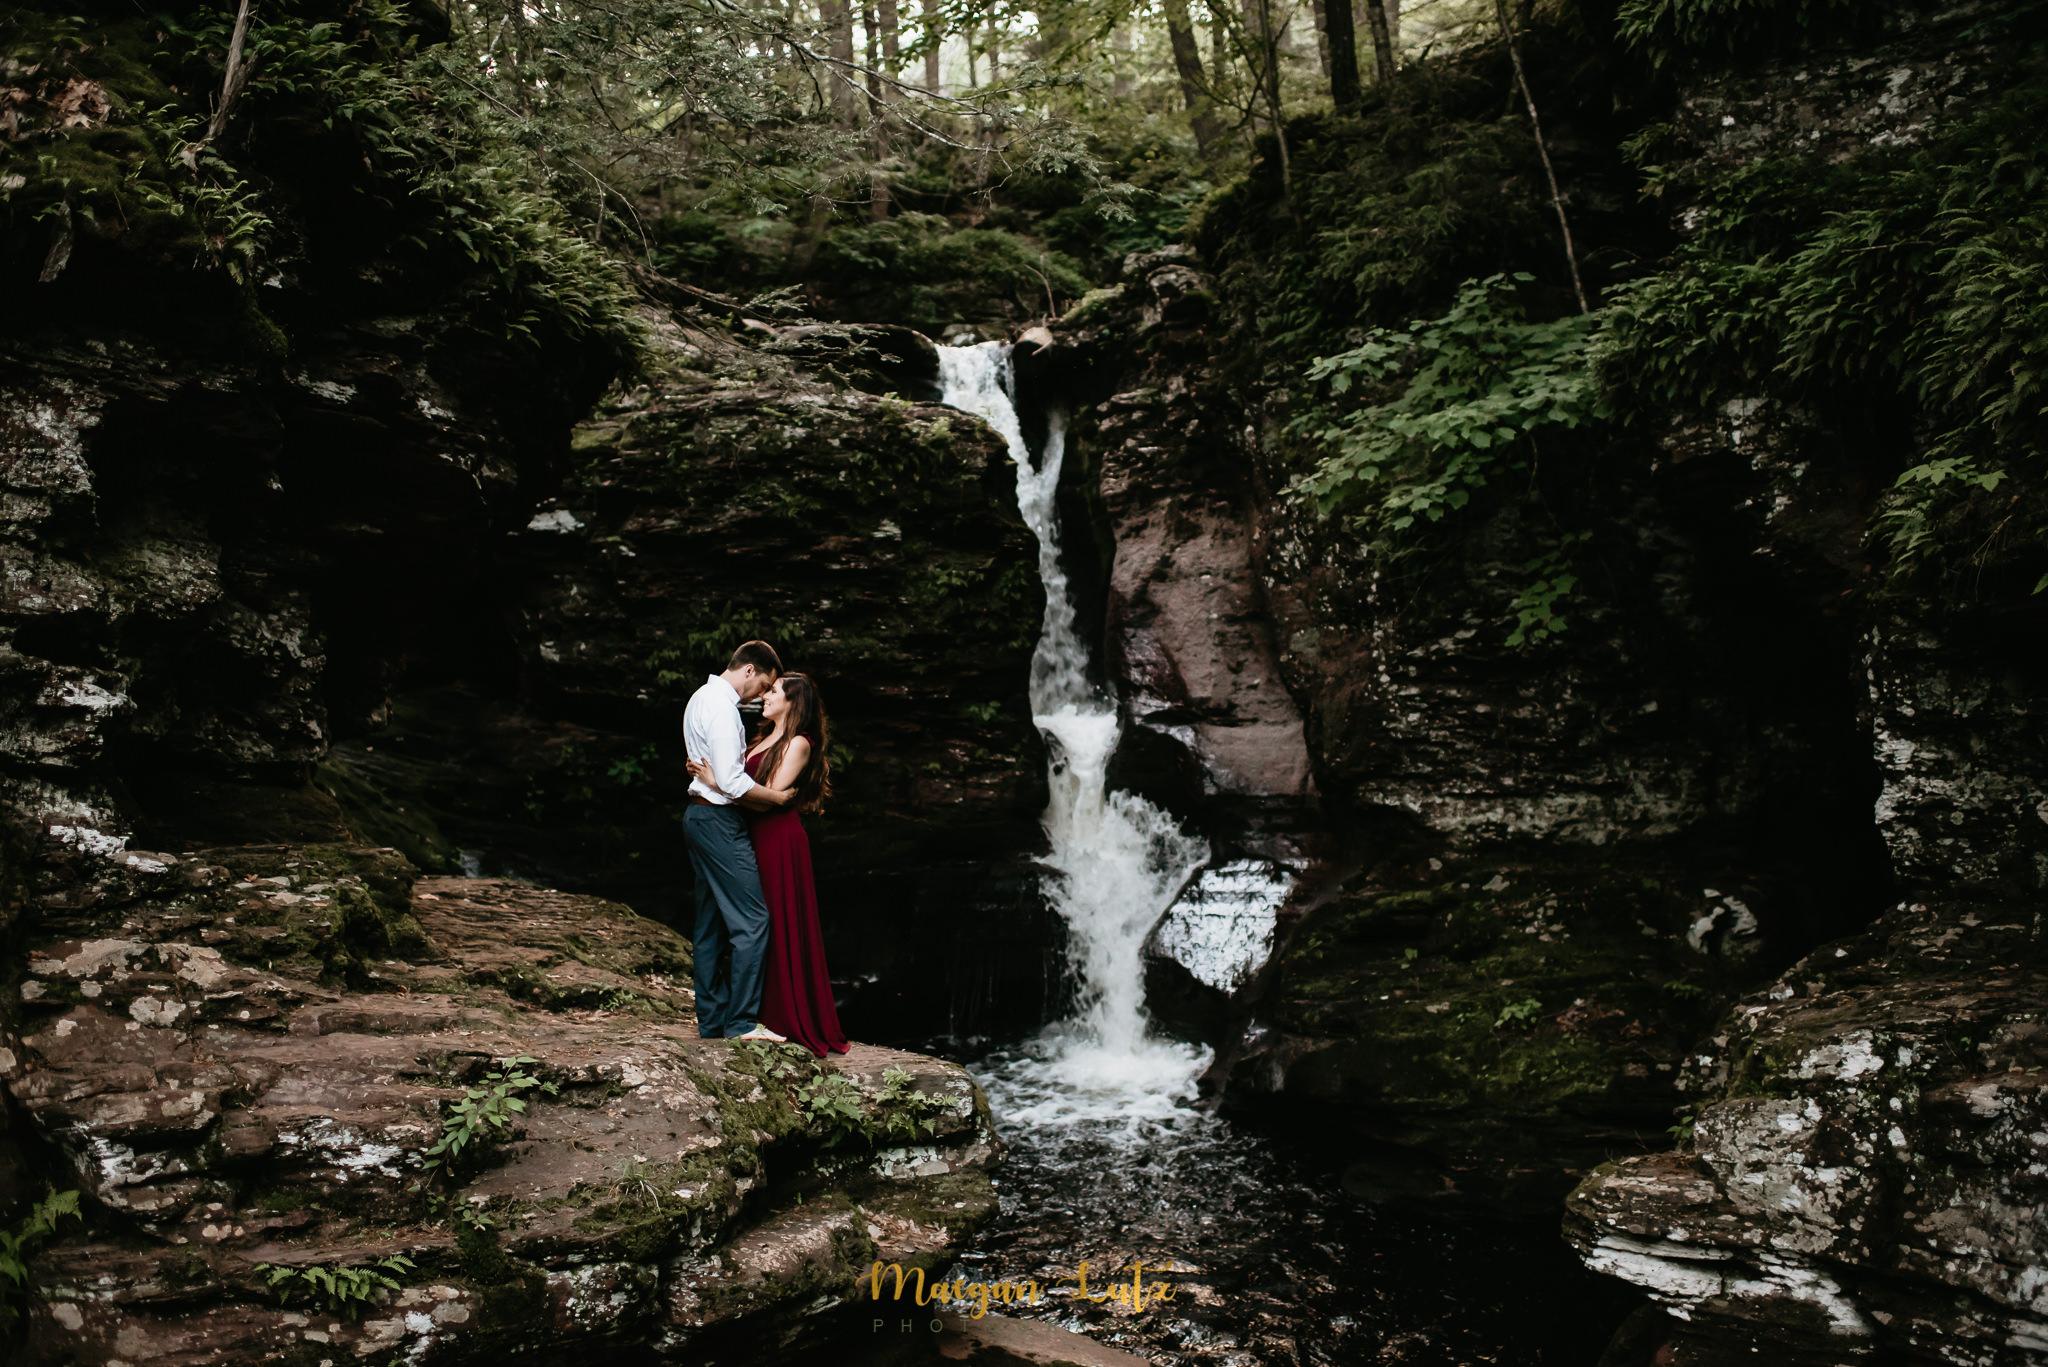 NEPA-Engagement-Wedding-Photographer-Session-at-Ricketts-Glen-State-Park-45.jpg